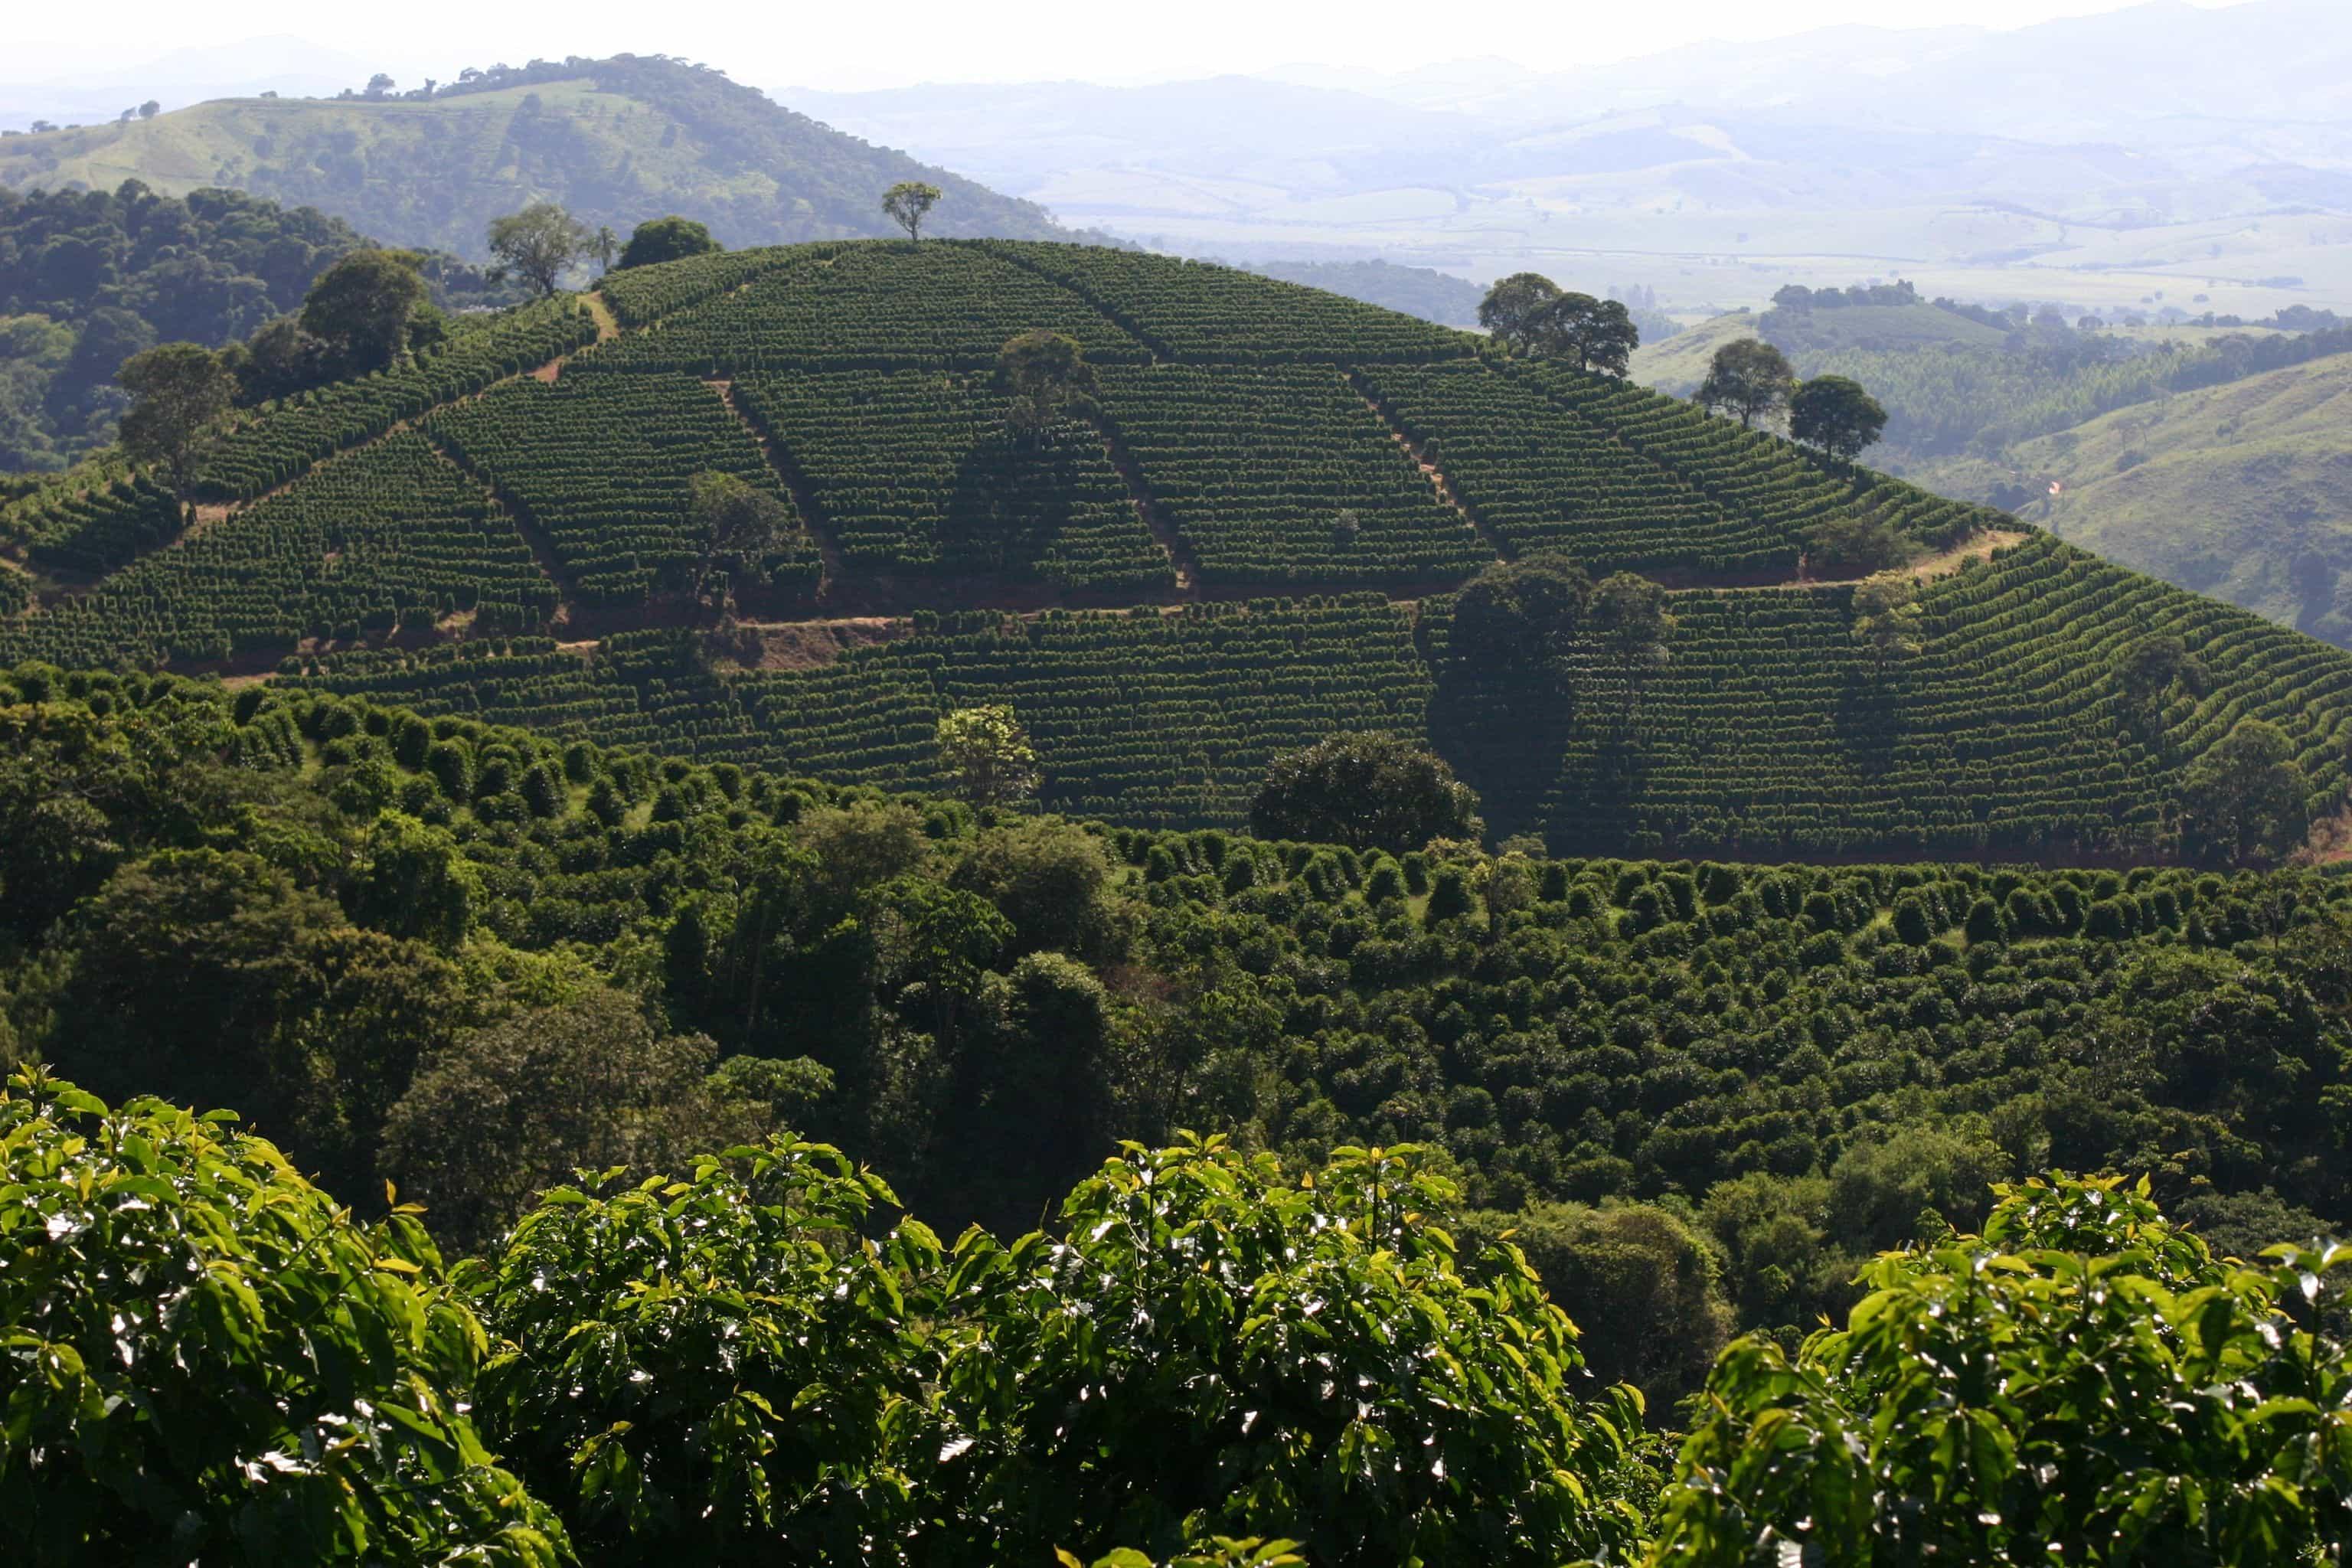 Manisha Desai The Nobletree Farm - Nobletree Coffee Opens First Shop